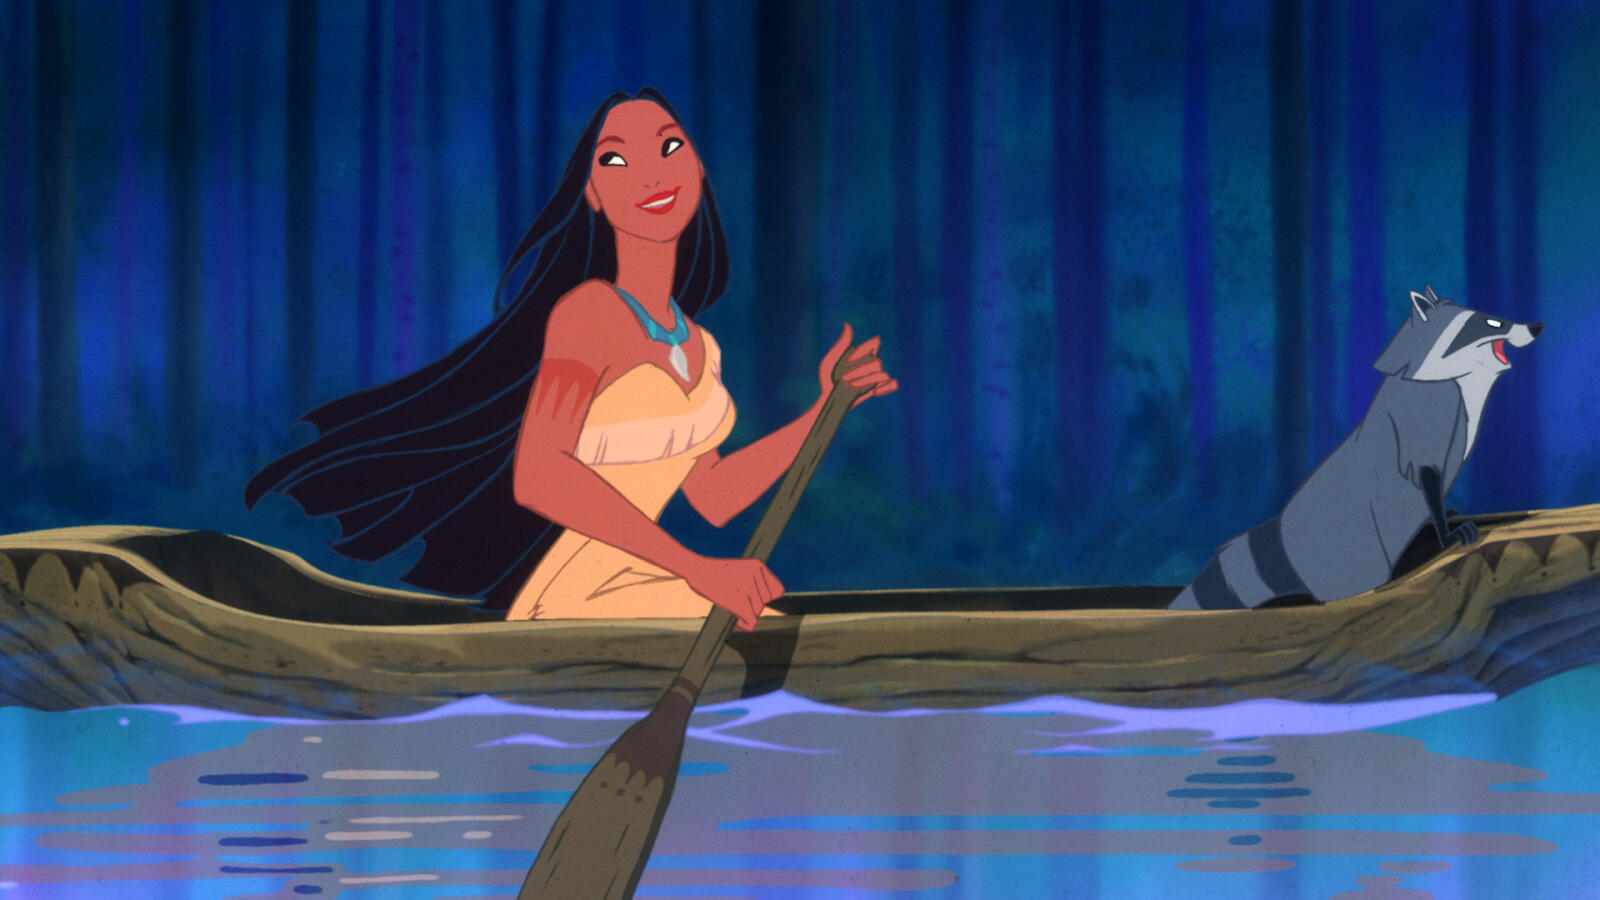 Pocahontas, plats 20 bland de 22 bästa Disneyfilmerna